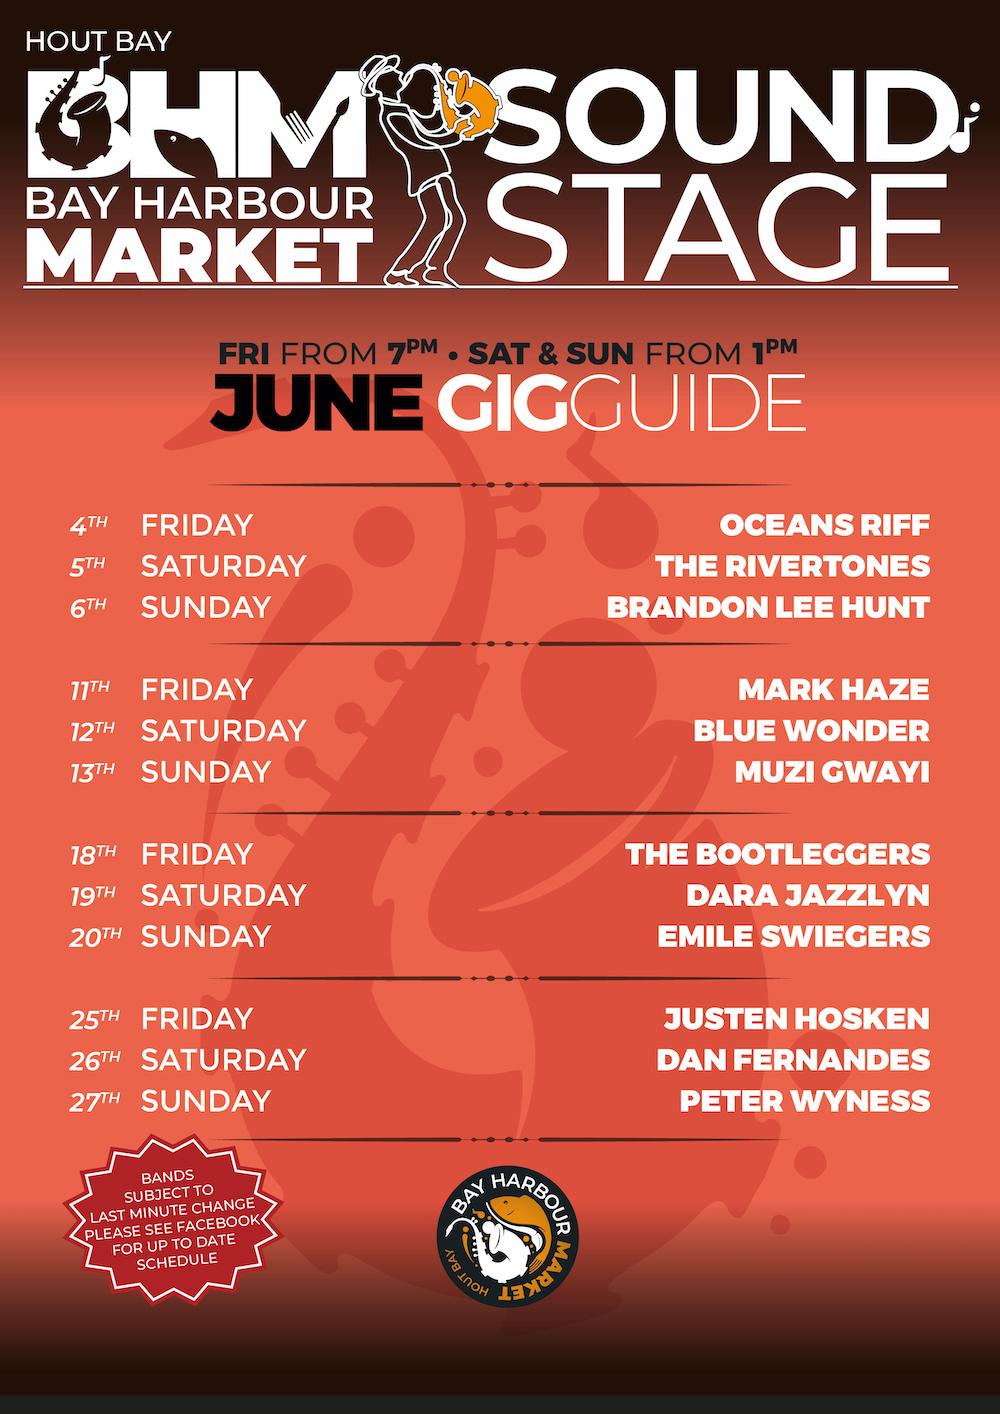 June gig guide at the bay harbour market